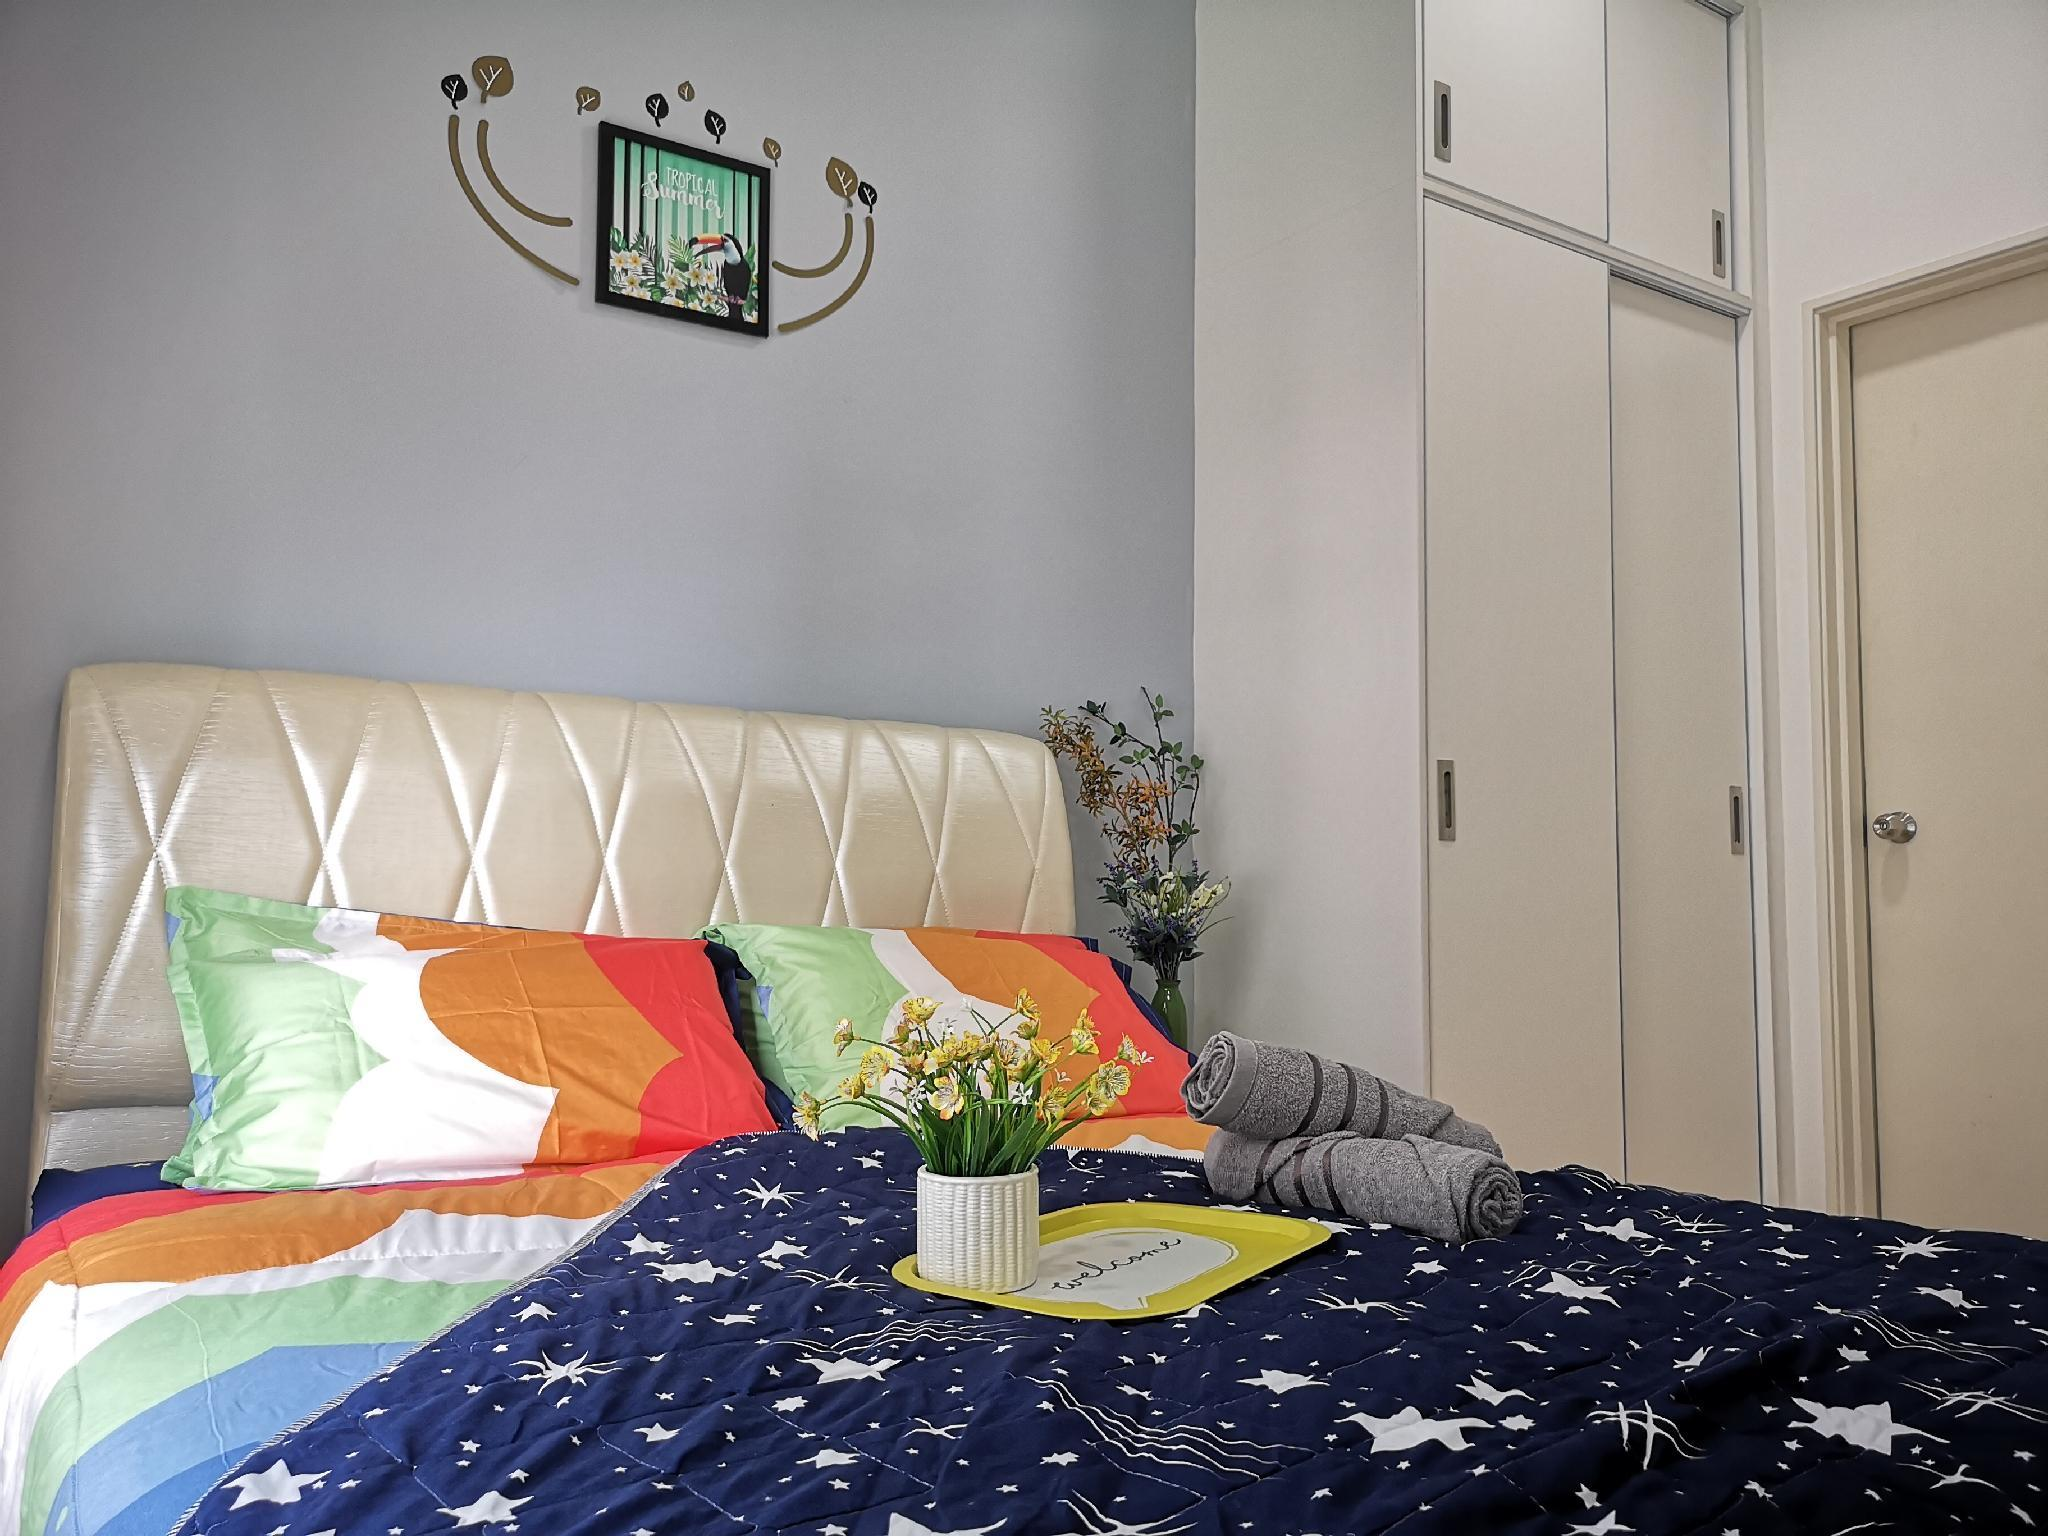 LOVELY HOME 2R2B Paradigm Sutera Utm Free Wifi